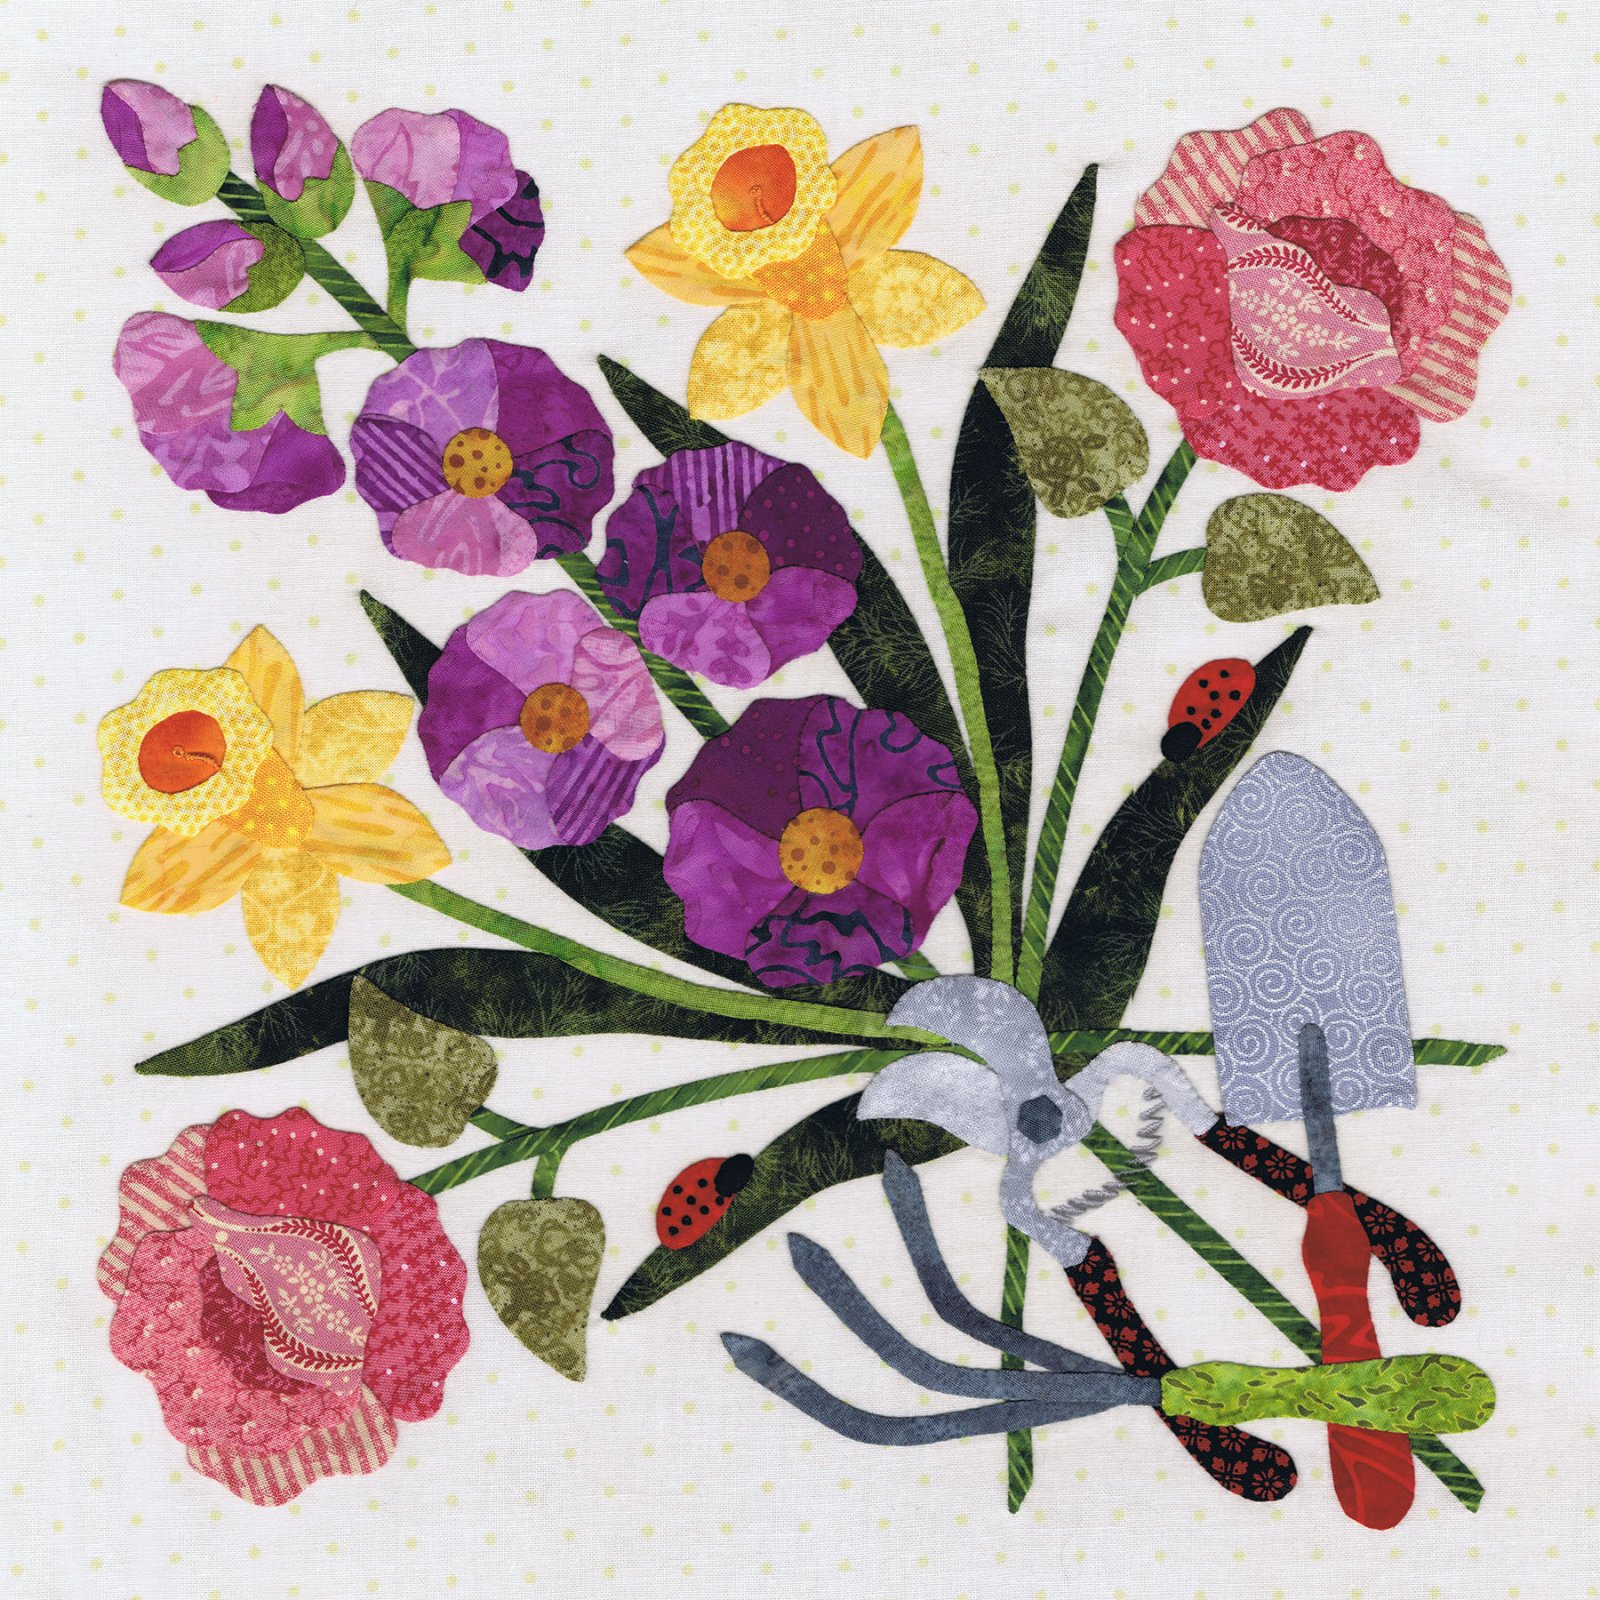 P3-2208 Garden Bouquet